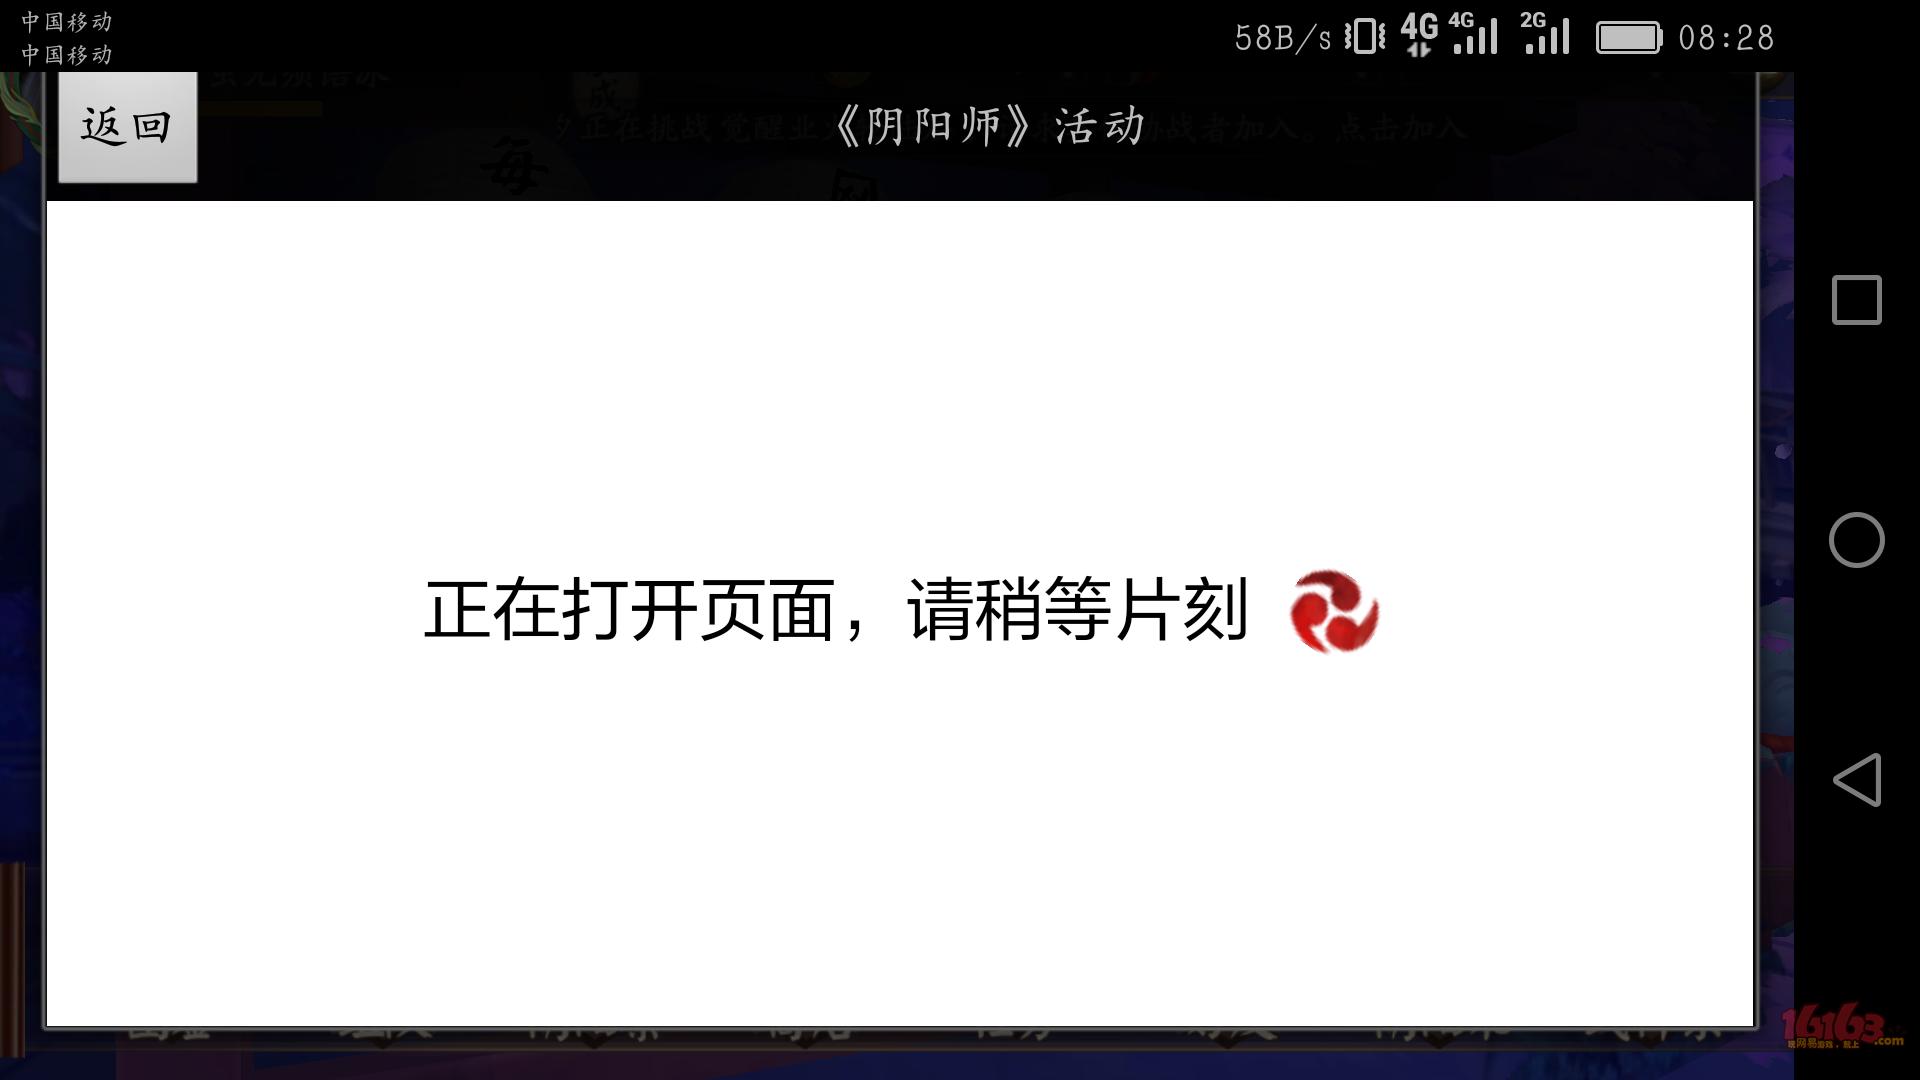 Screenshot_2016-11-11-08-28-00.png